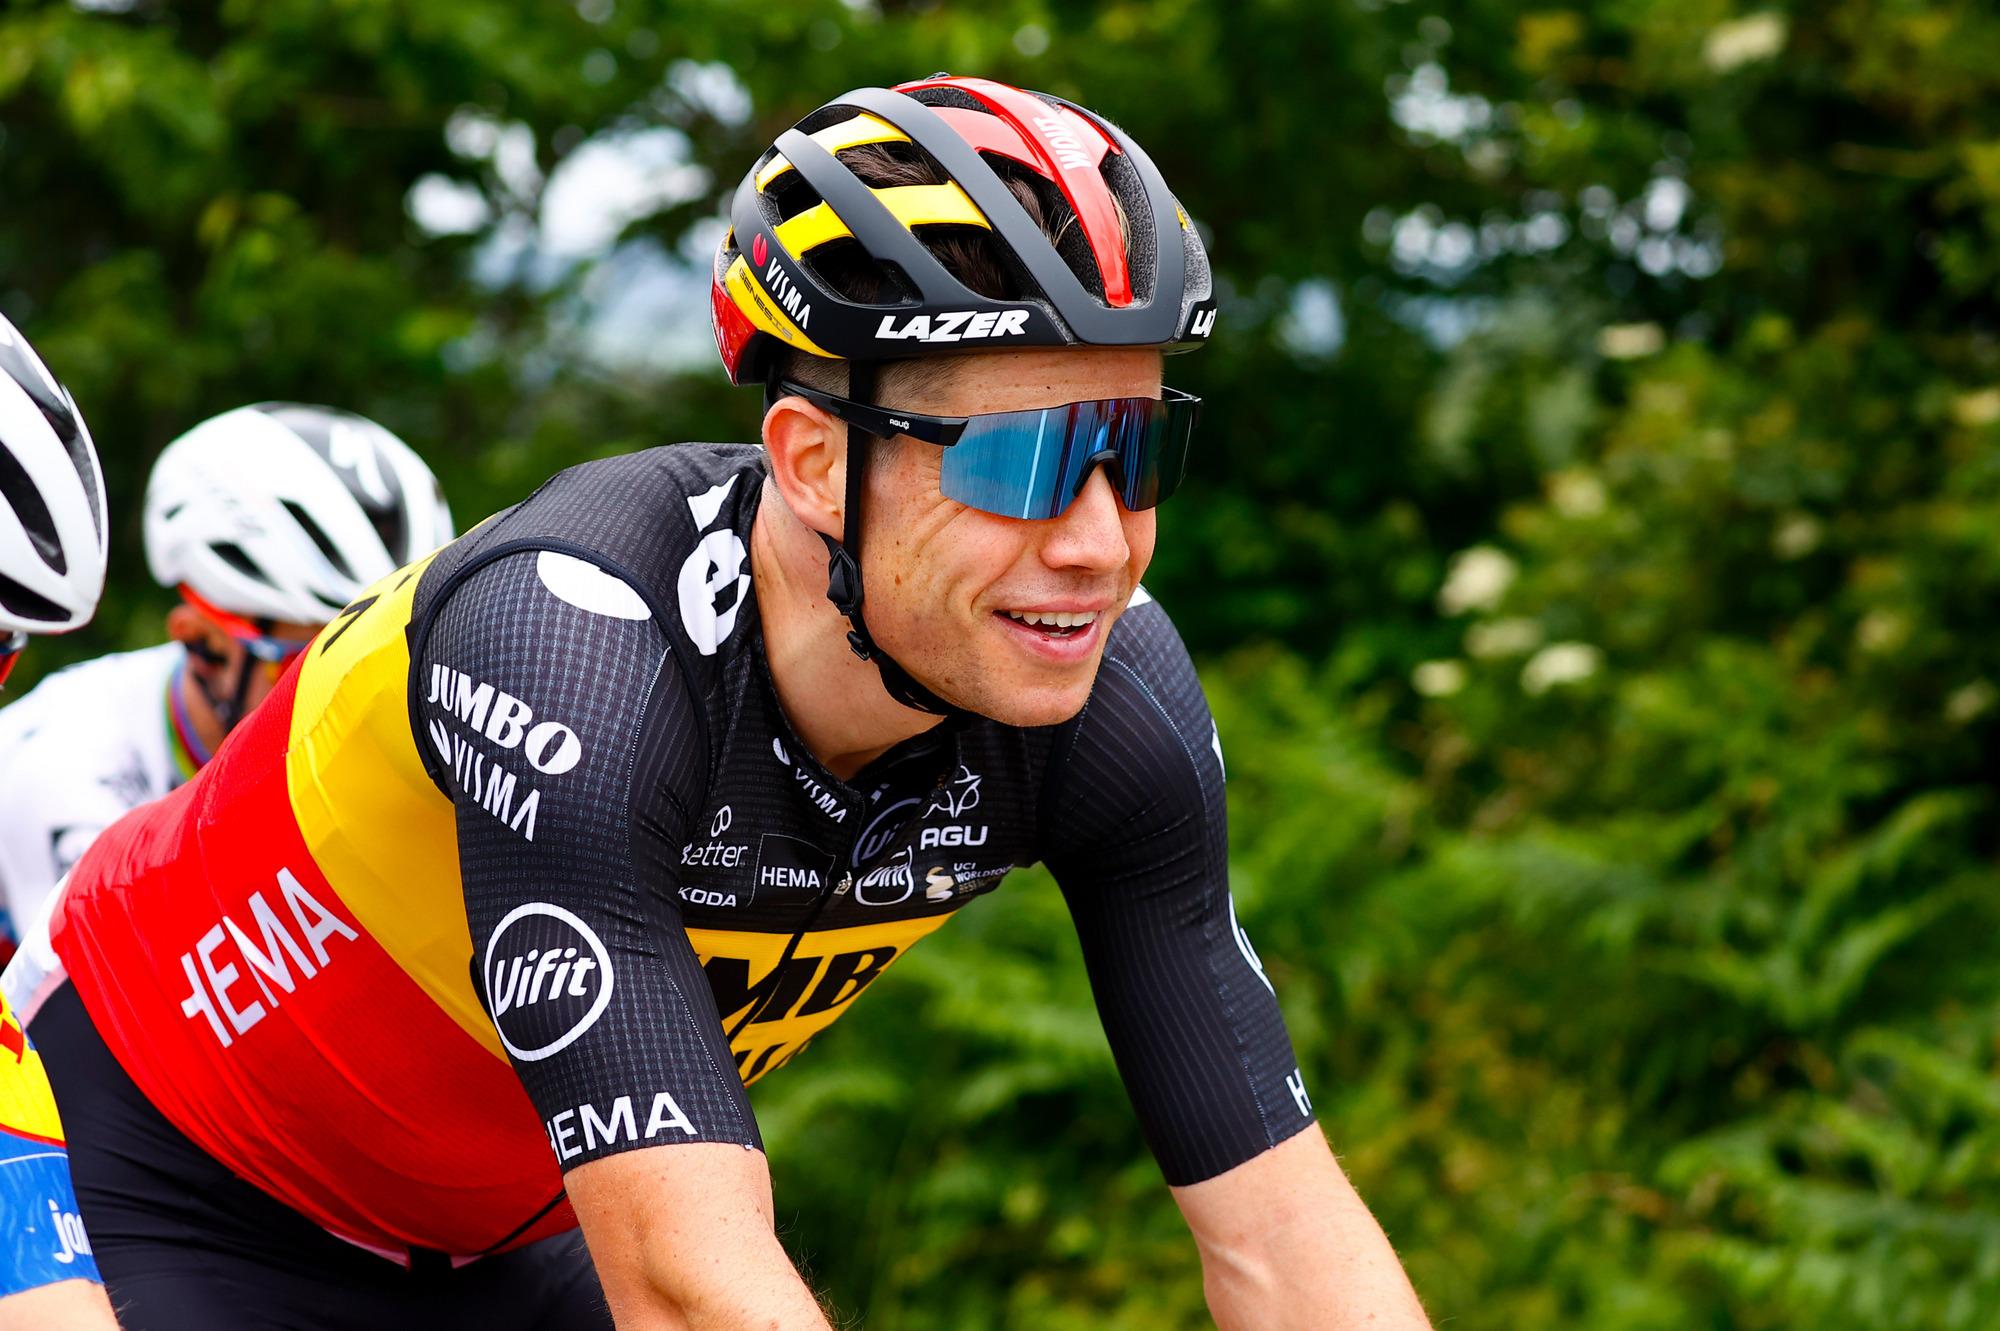 Tour de France 2021 108th Edition 1st stage Brest Landerneau 1978 km 26062021 Wout Van Aert BEL Jumbo Visma photo Luca BettiniBettiniPhoto2021